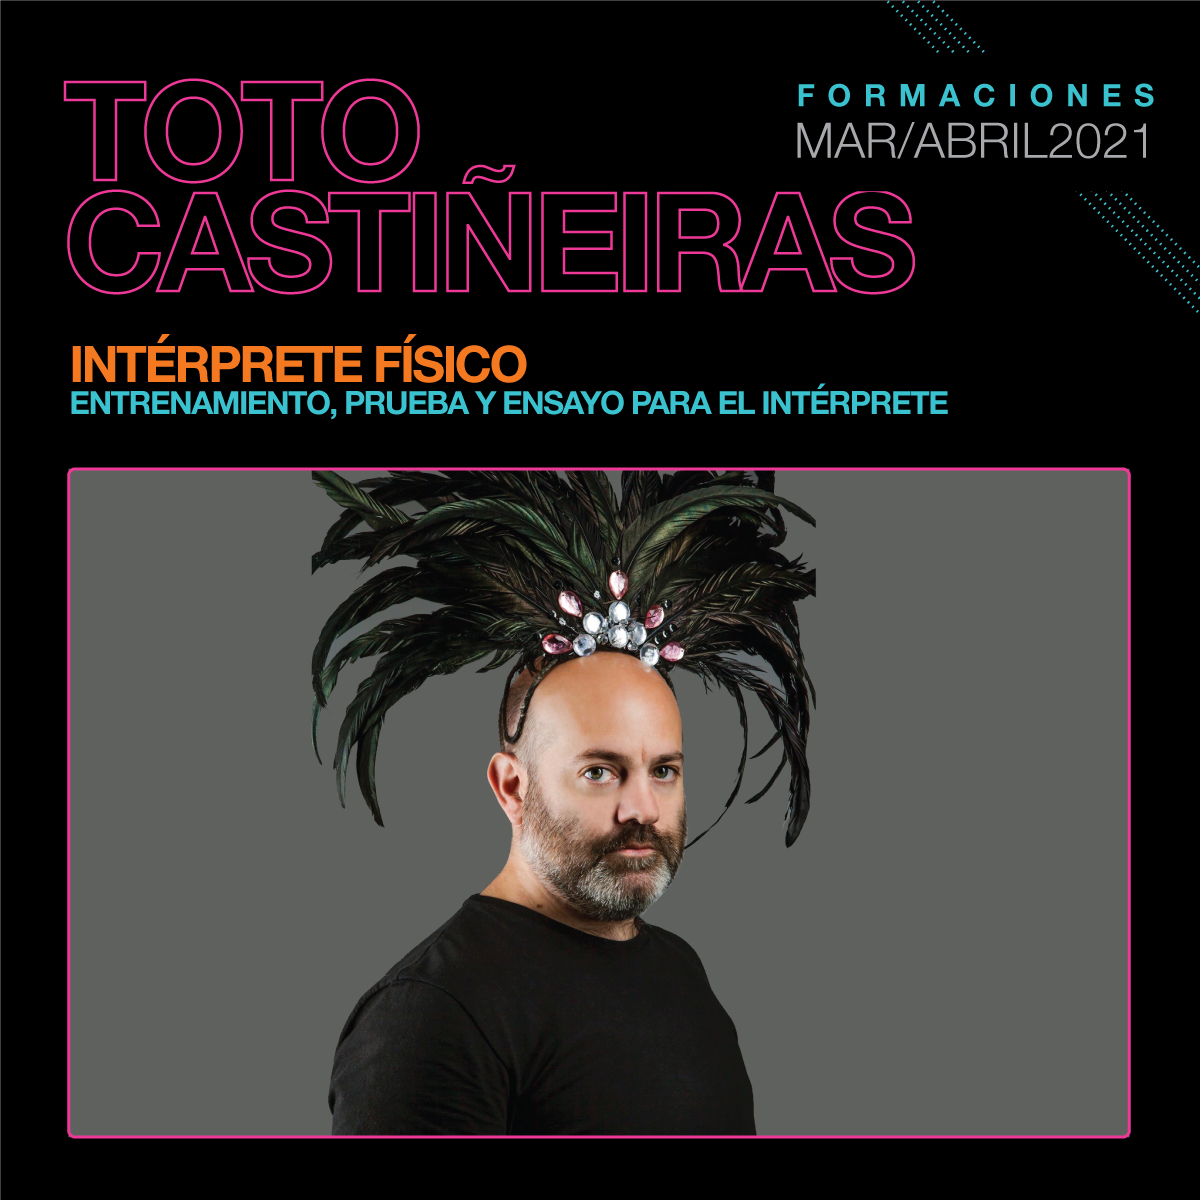 Clases Toto Castineiras planta inclan